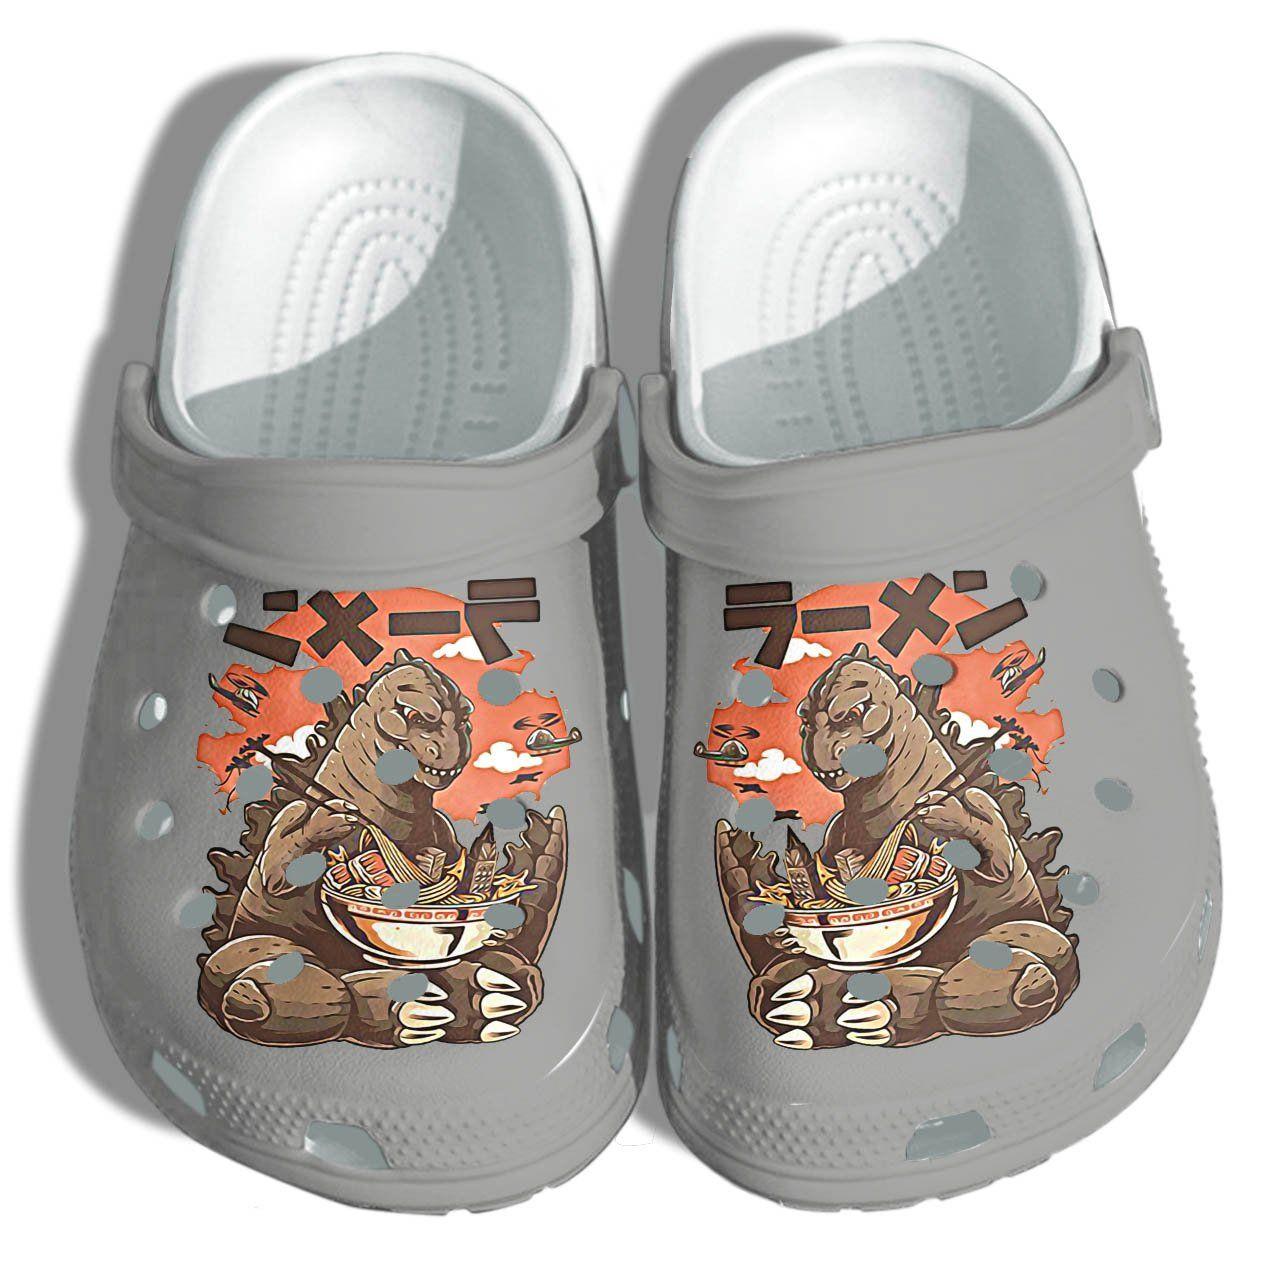 Photo of Godzilla Anime Shoes Croc 2021 Funny – Anime Godzilla Noodle Japan Shoes Croc For Men Women